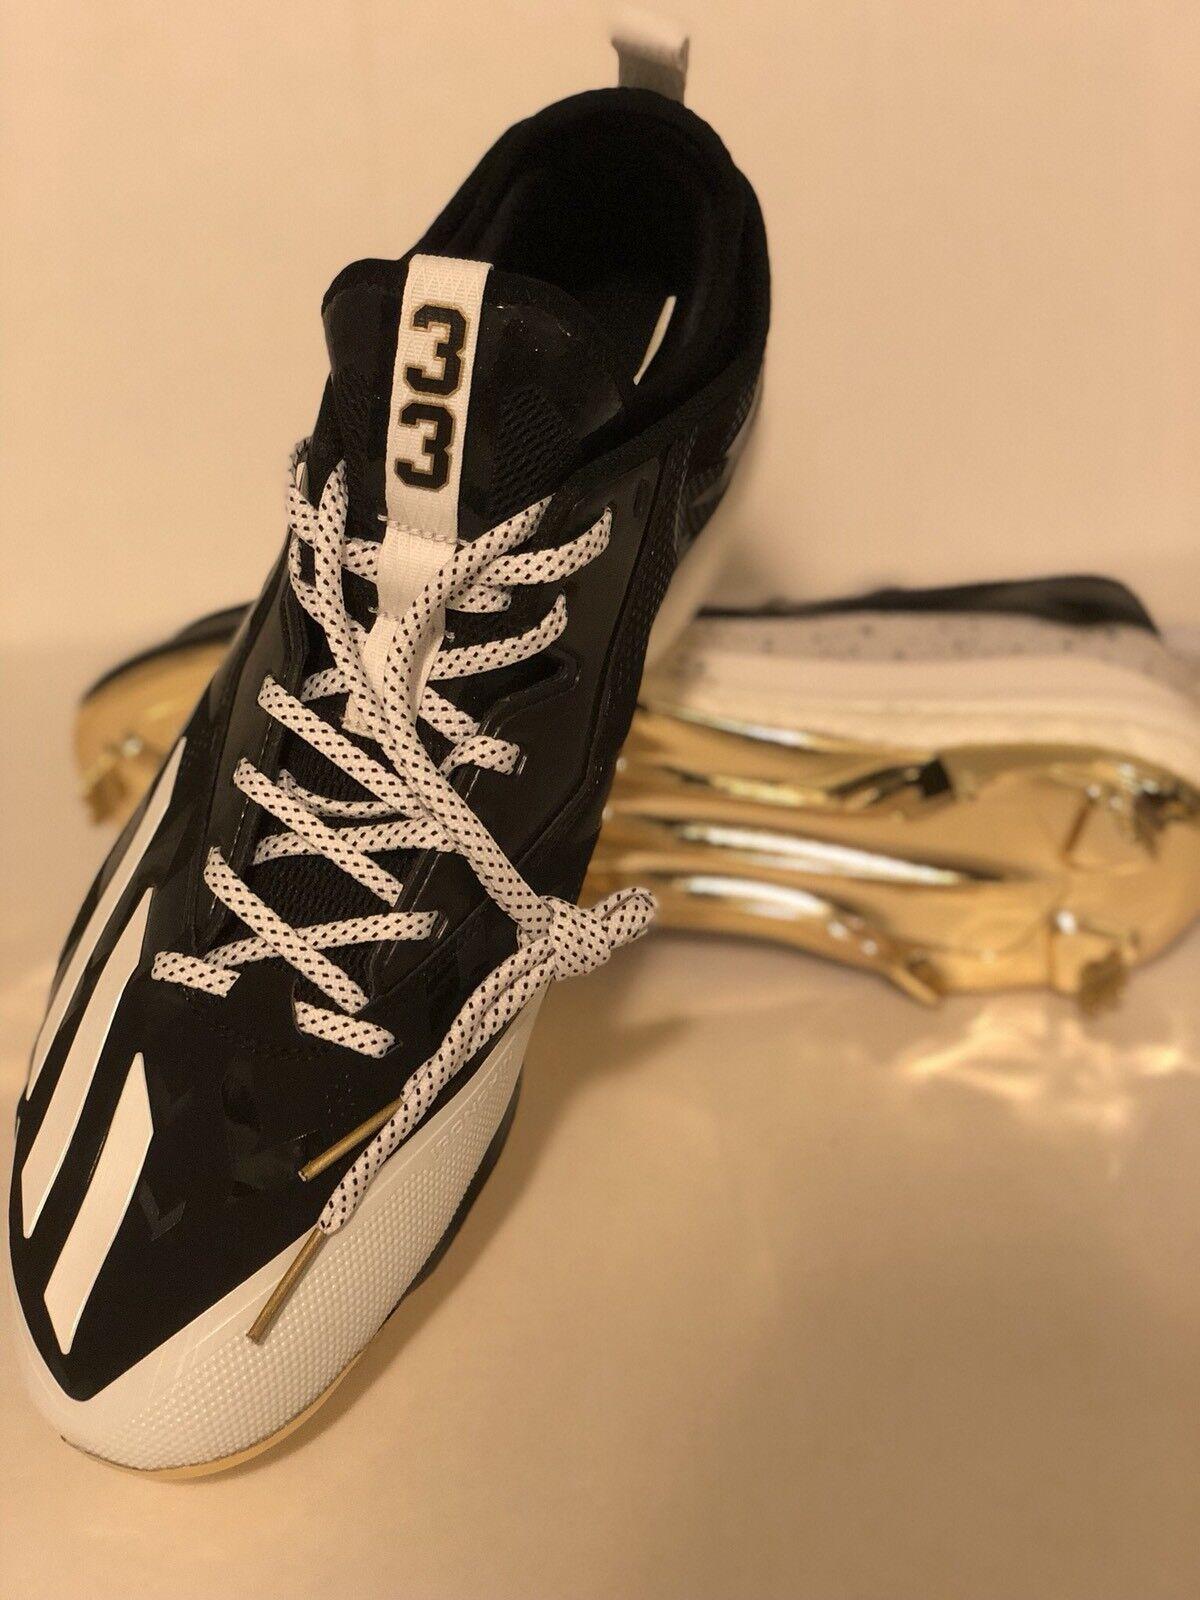 Adidas energieschubs symbol 2.0 james shields pe - stollen bw0797 größe 12,5